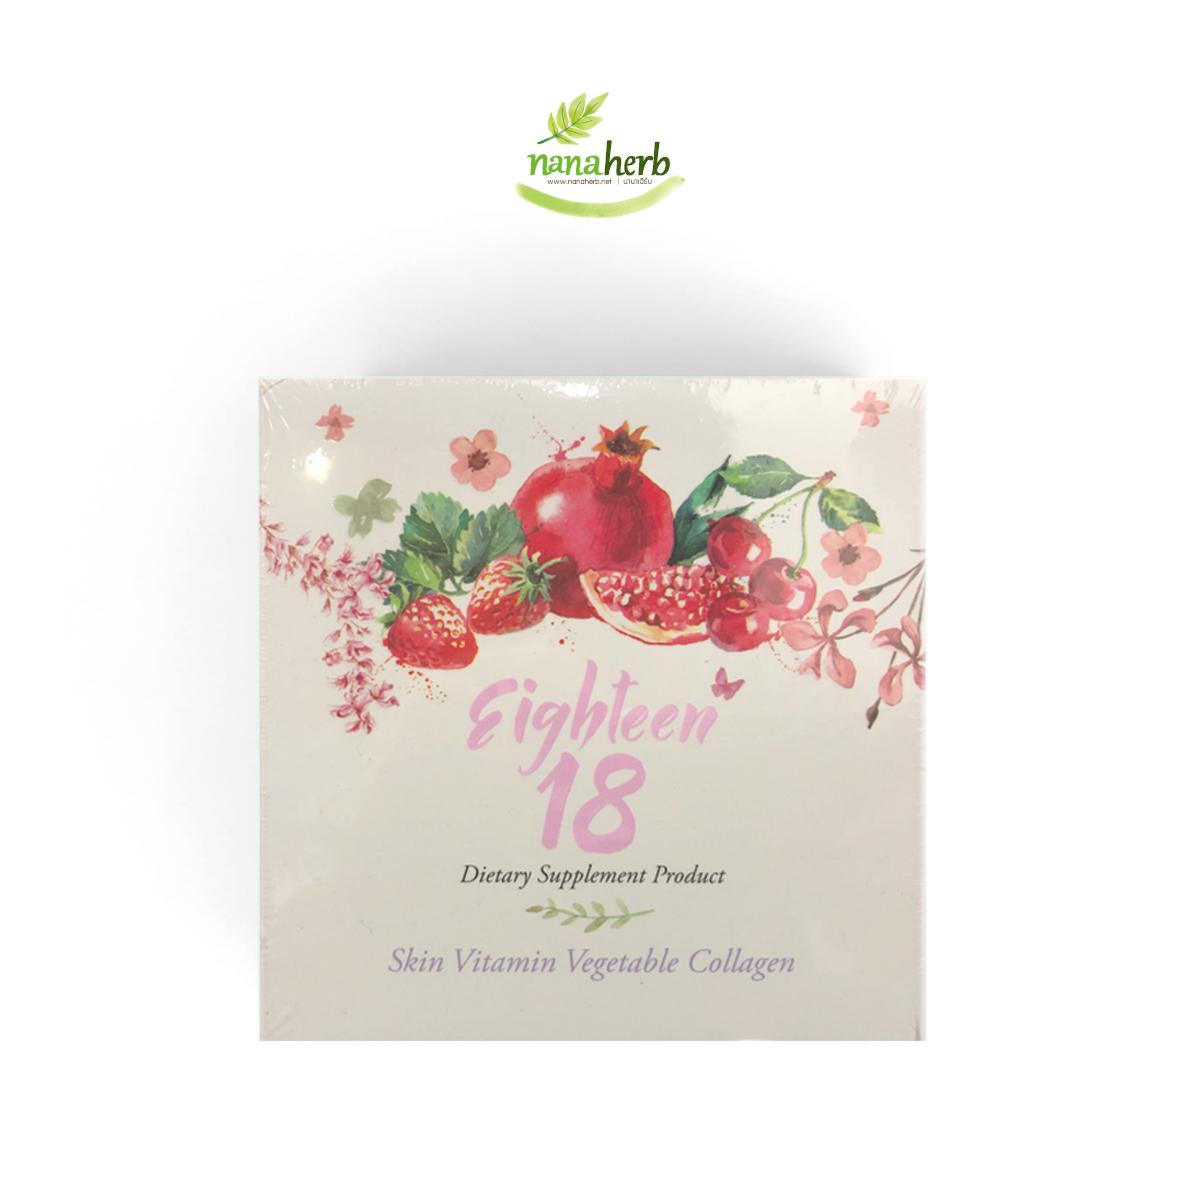 Eighteen18 (เอธ-ธีน 18)